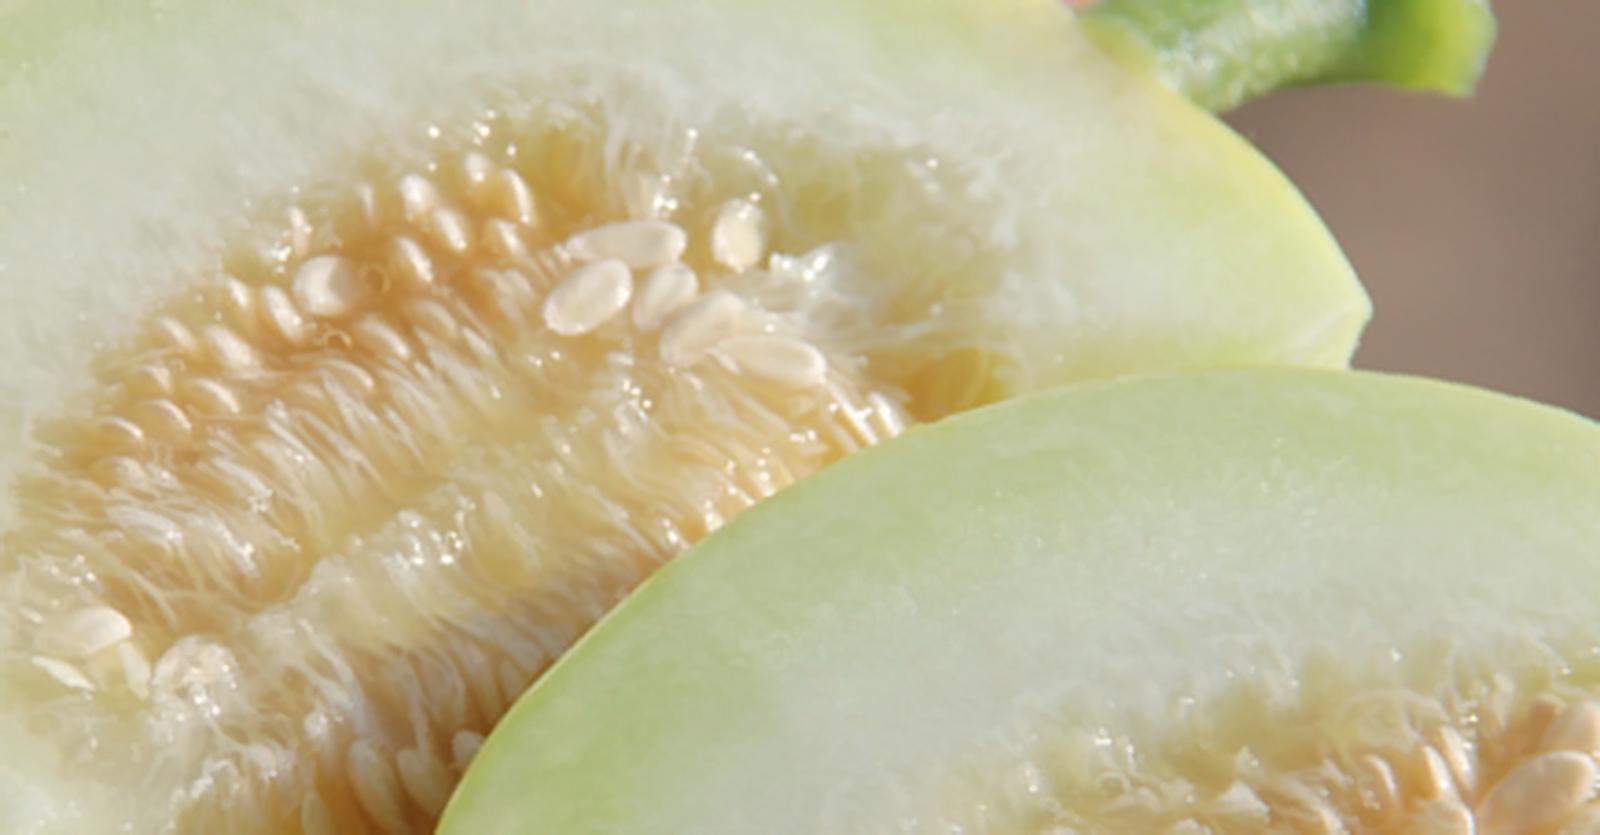 Manfaat Sehat Buah Melon (Cucumis melo)